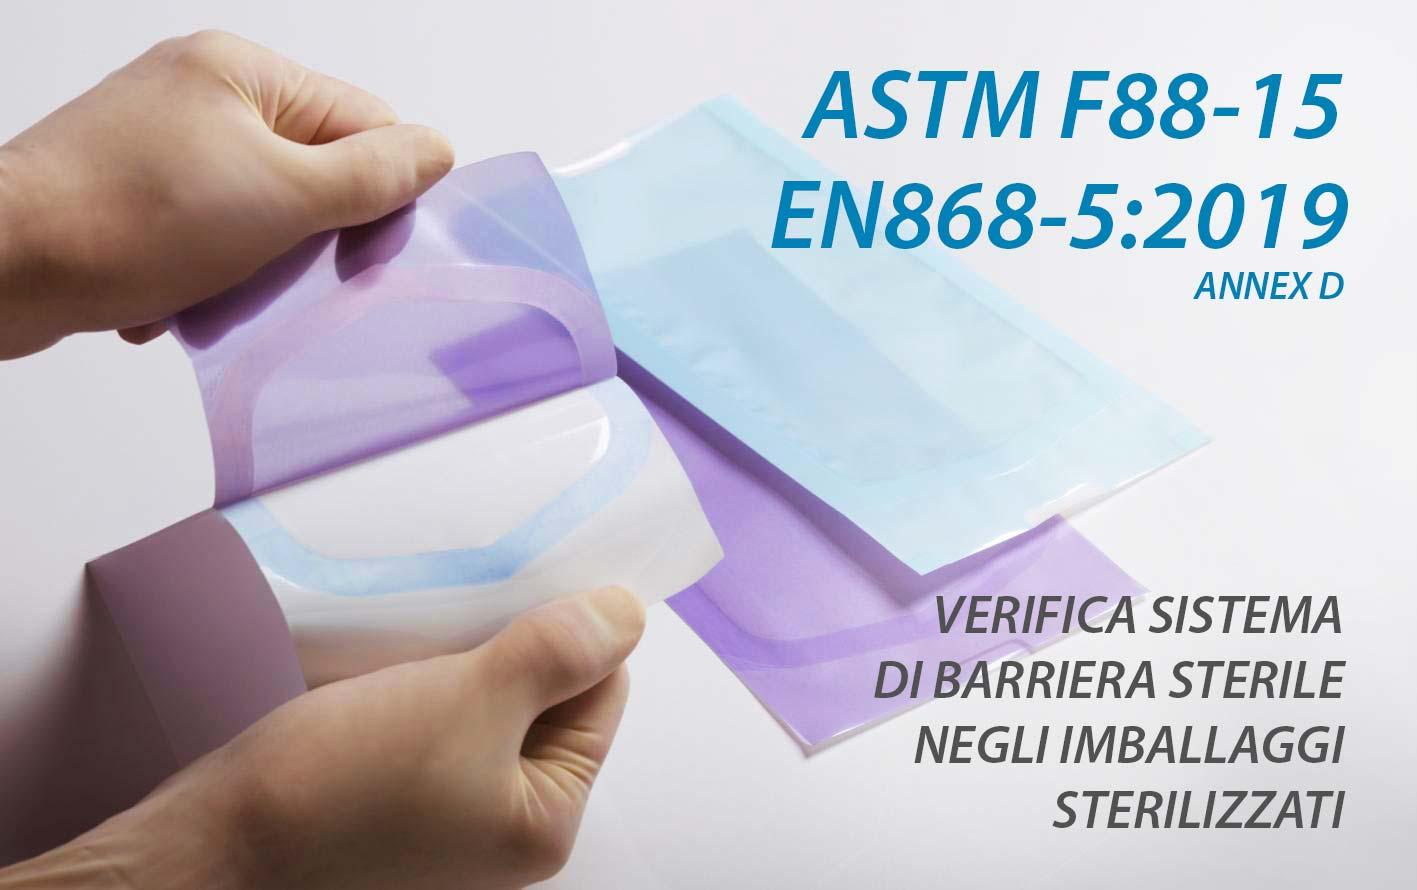 EN 868-5 e ASTM F88